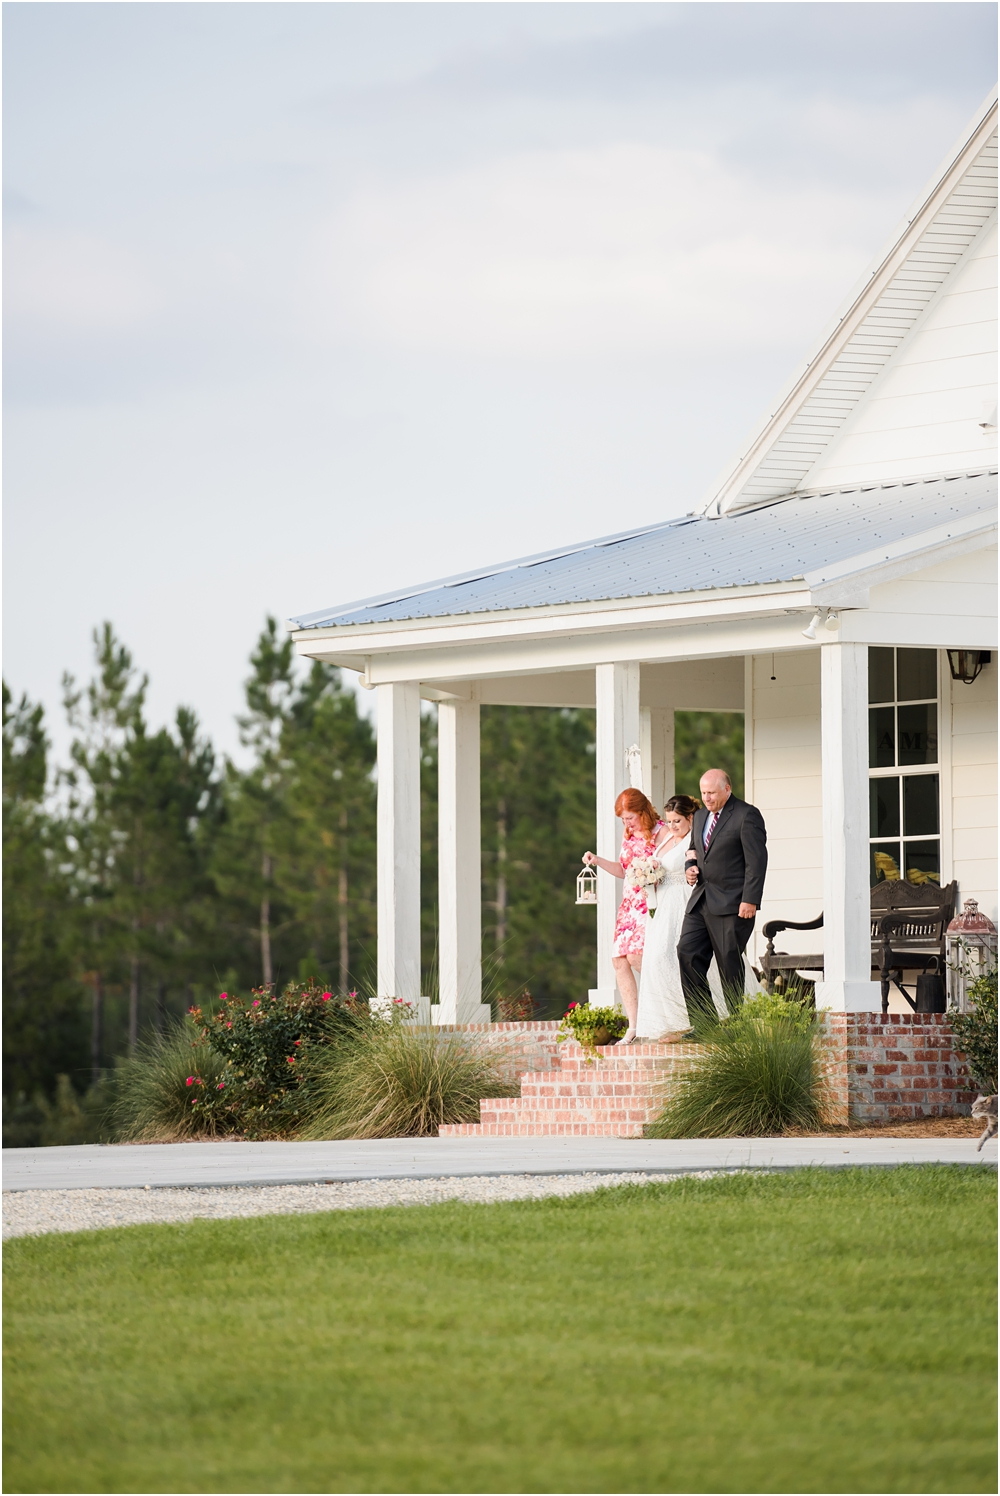 mosley-wedding-kiersten-stevenson-photography-30a-panama-city-beach-dothan-tallahassee-(136-of-472).JPG